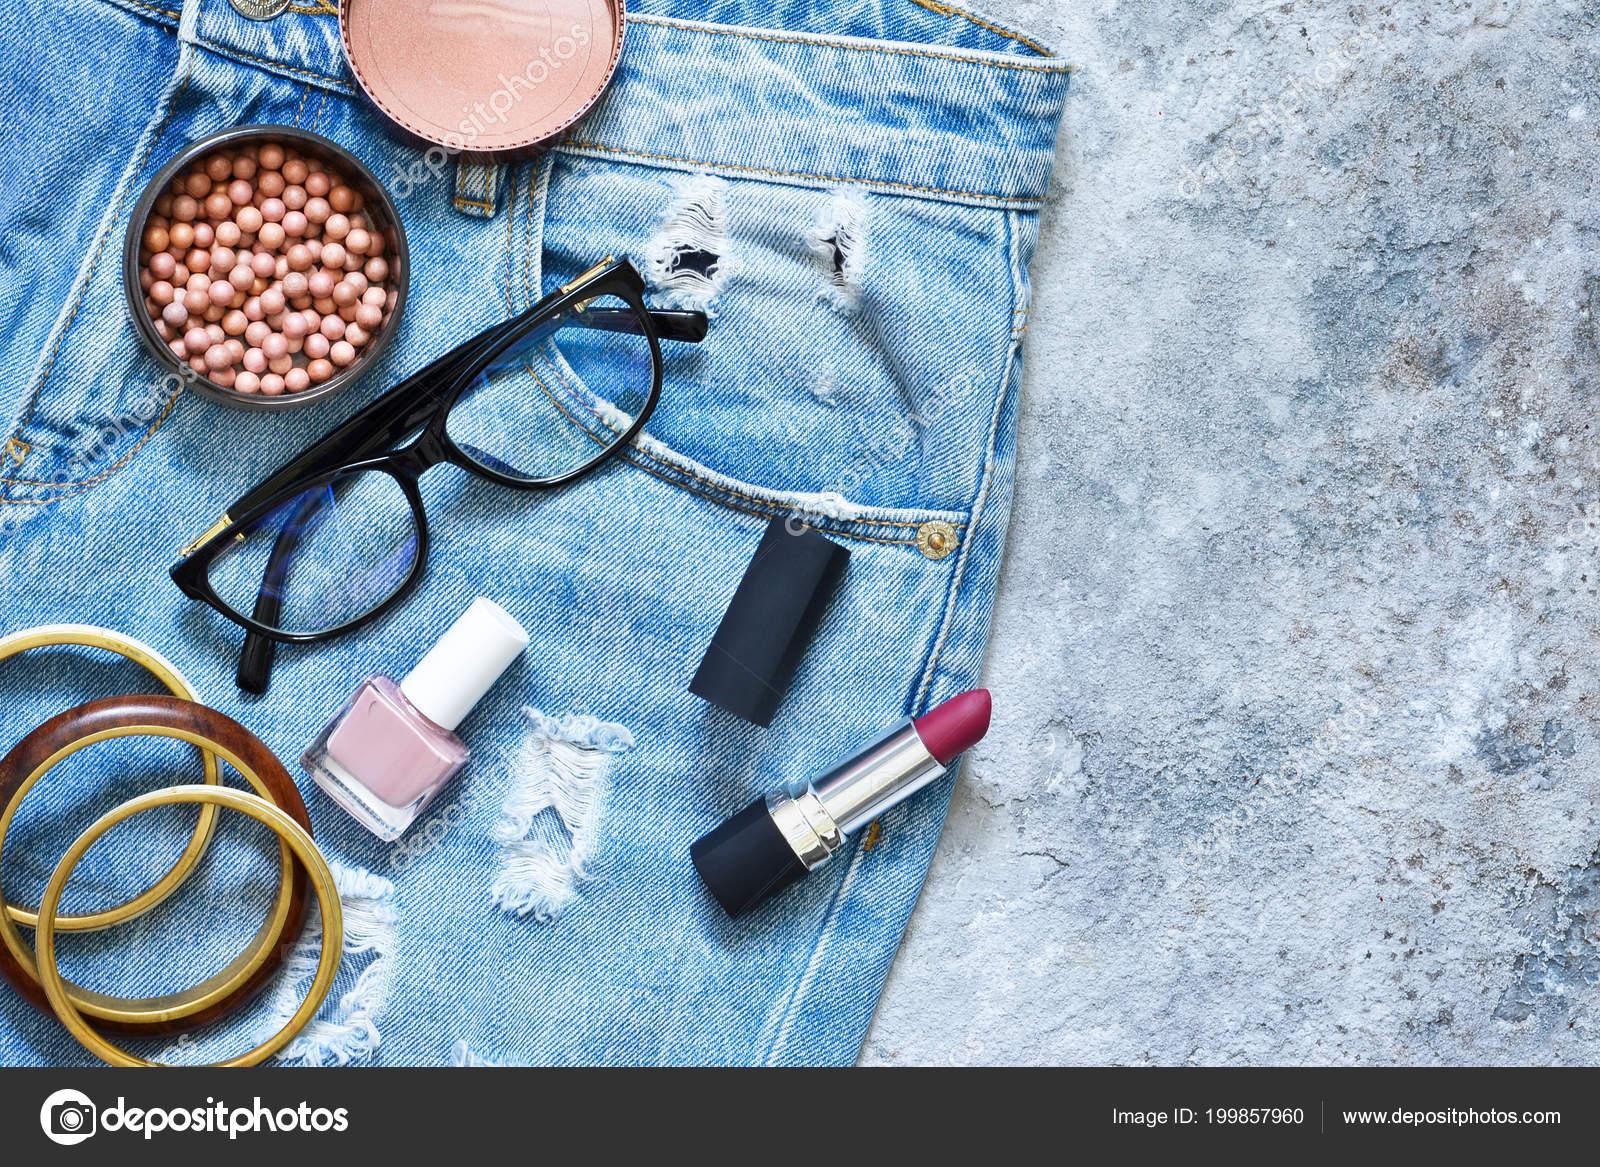 0acca0ded6 Moda Ropa Para Mujer Calzado Accesorios Cosméticos Para Maquillaje — Fotos  de Stock